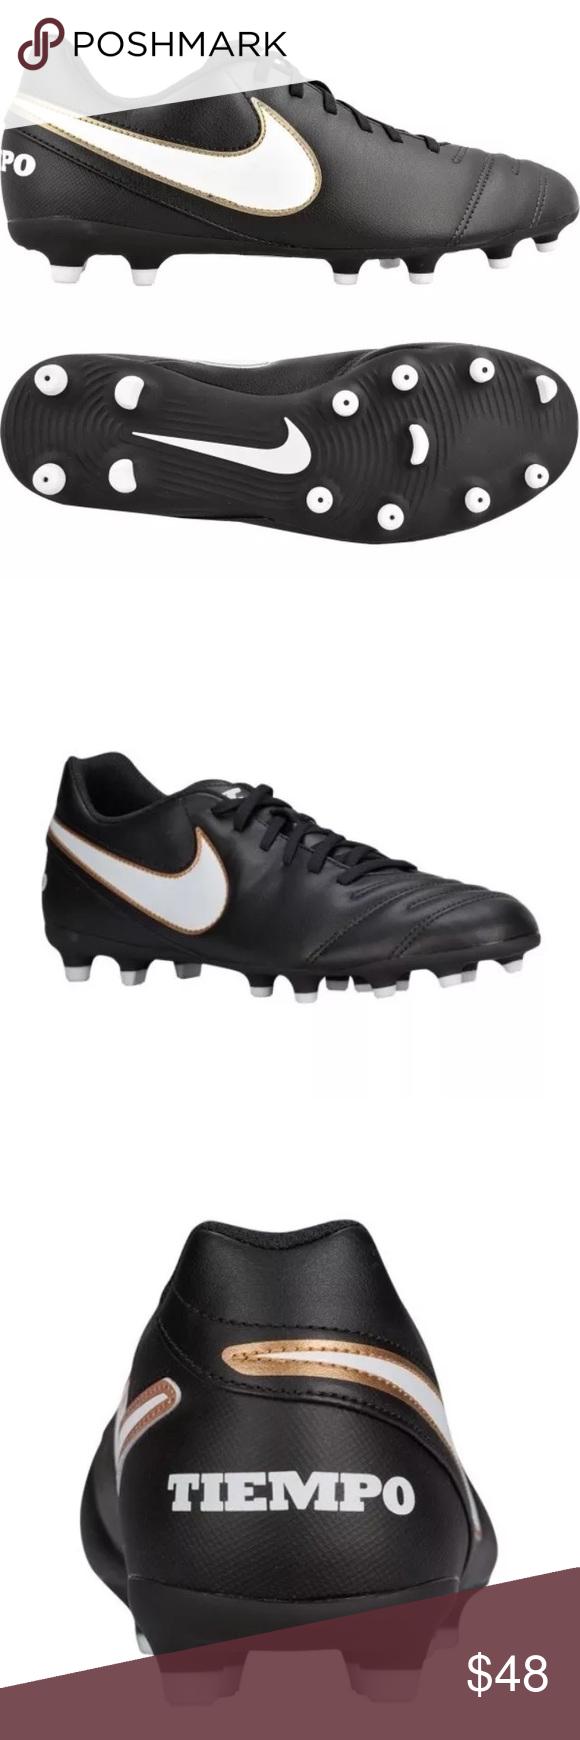 e02b7489d Nike Tiempo Rio III FG Soccer Cleats (819233-010) Nike Tiempo Rio III FG  Soccer Cleats (819233-010) Nike Shoes Athletic Shoes